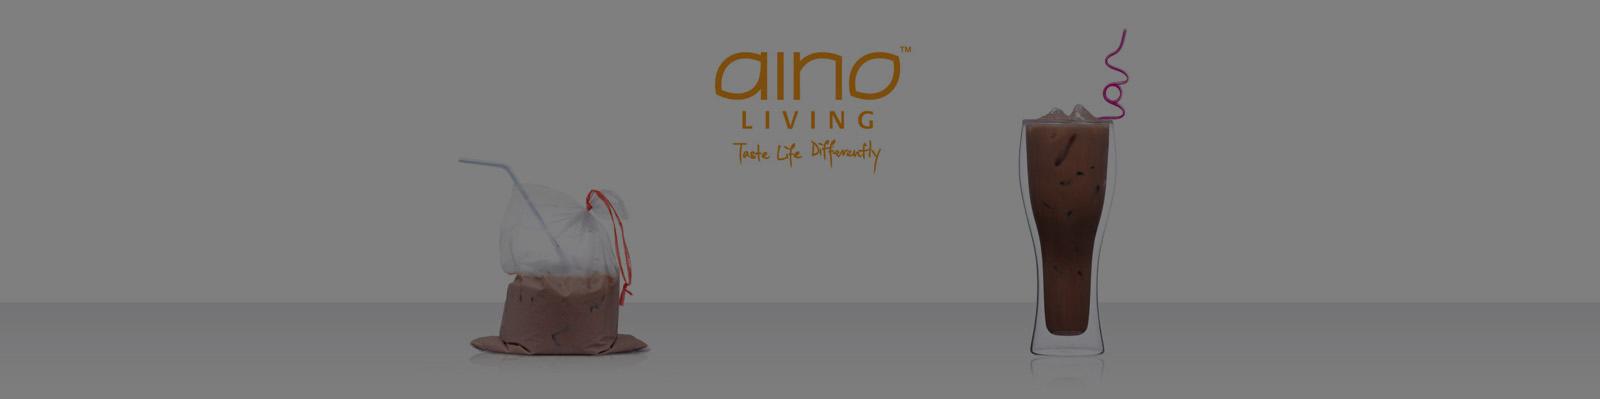 AINO LIVING